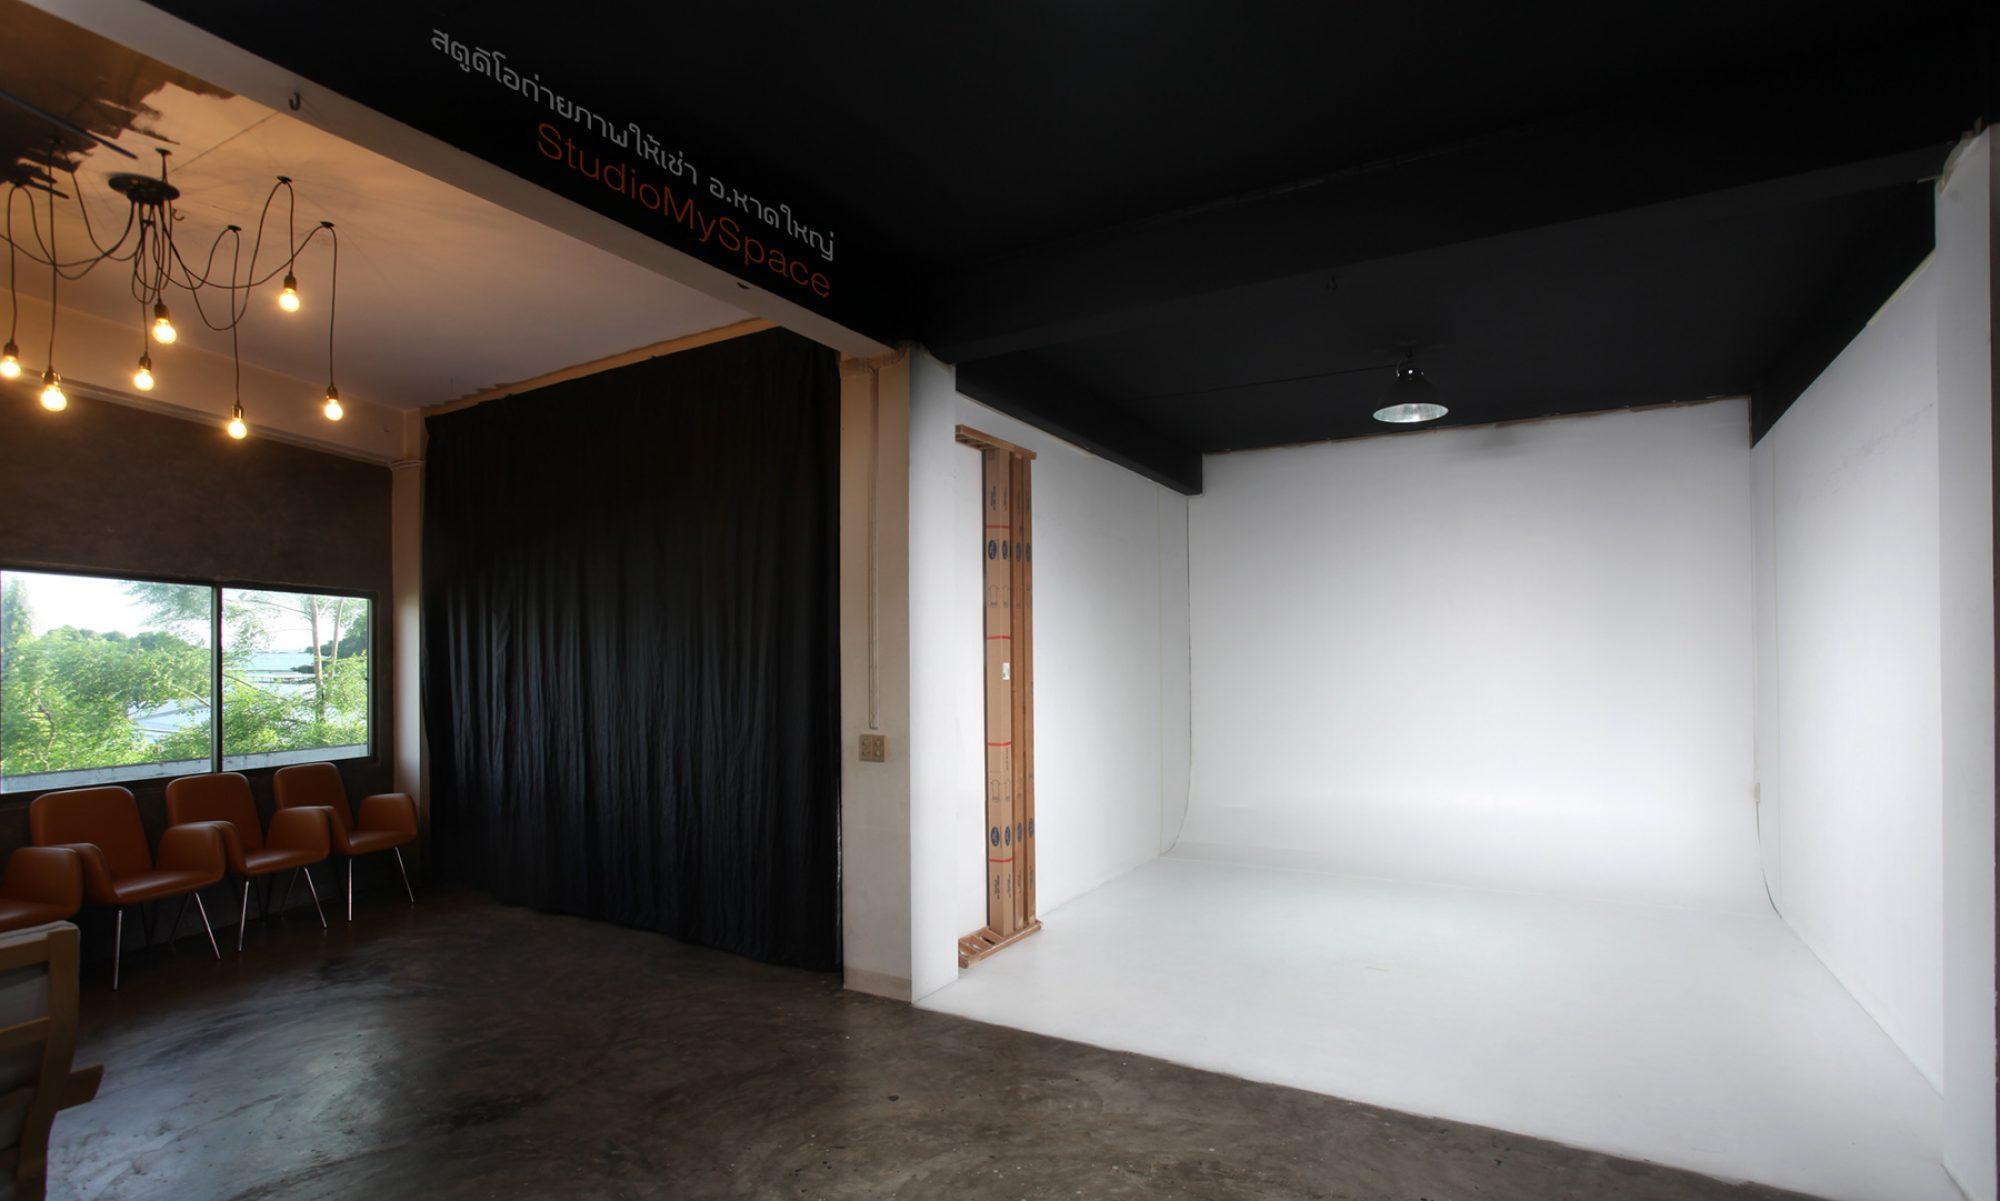 StudioMySpace : สตูดิโอถ่ายภาพ ให้เช่า หาดใหญ่ ถ่ายภาพมืออาชีพ ถ่ายภาพอาหาร ถ่ายภาพสินค้า